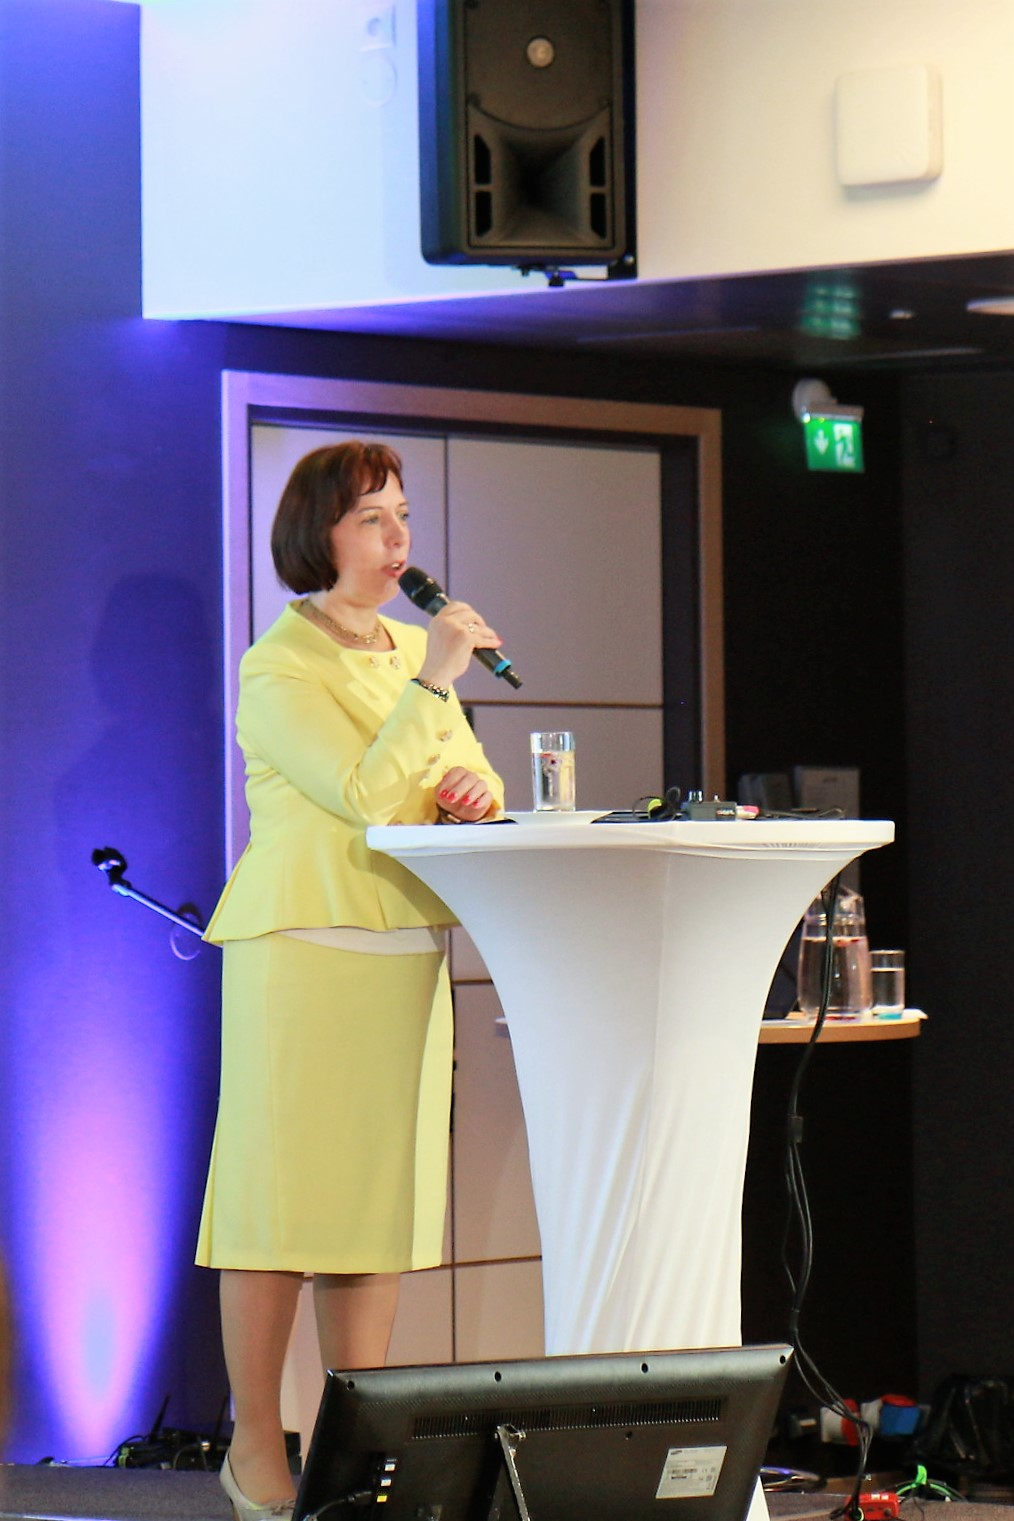 Mailis Reps pidas konverentsi avakõne. Foto autor: Sandra Fomotškin (HTM)